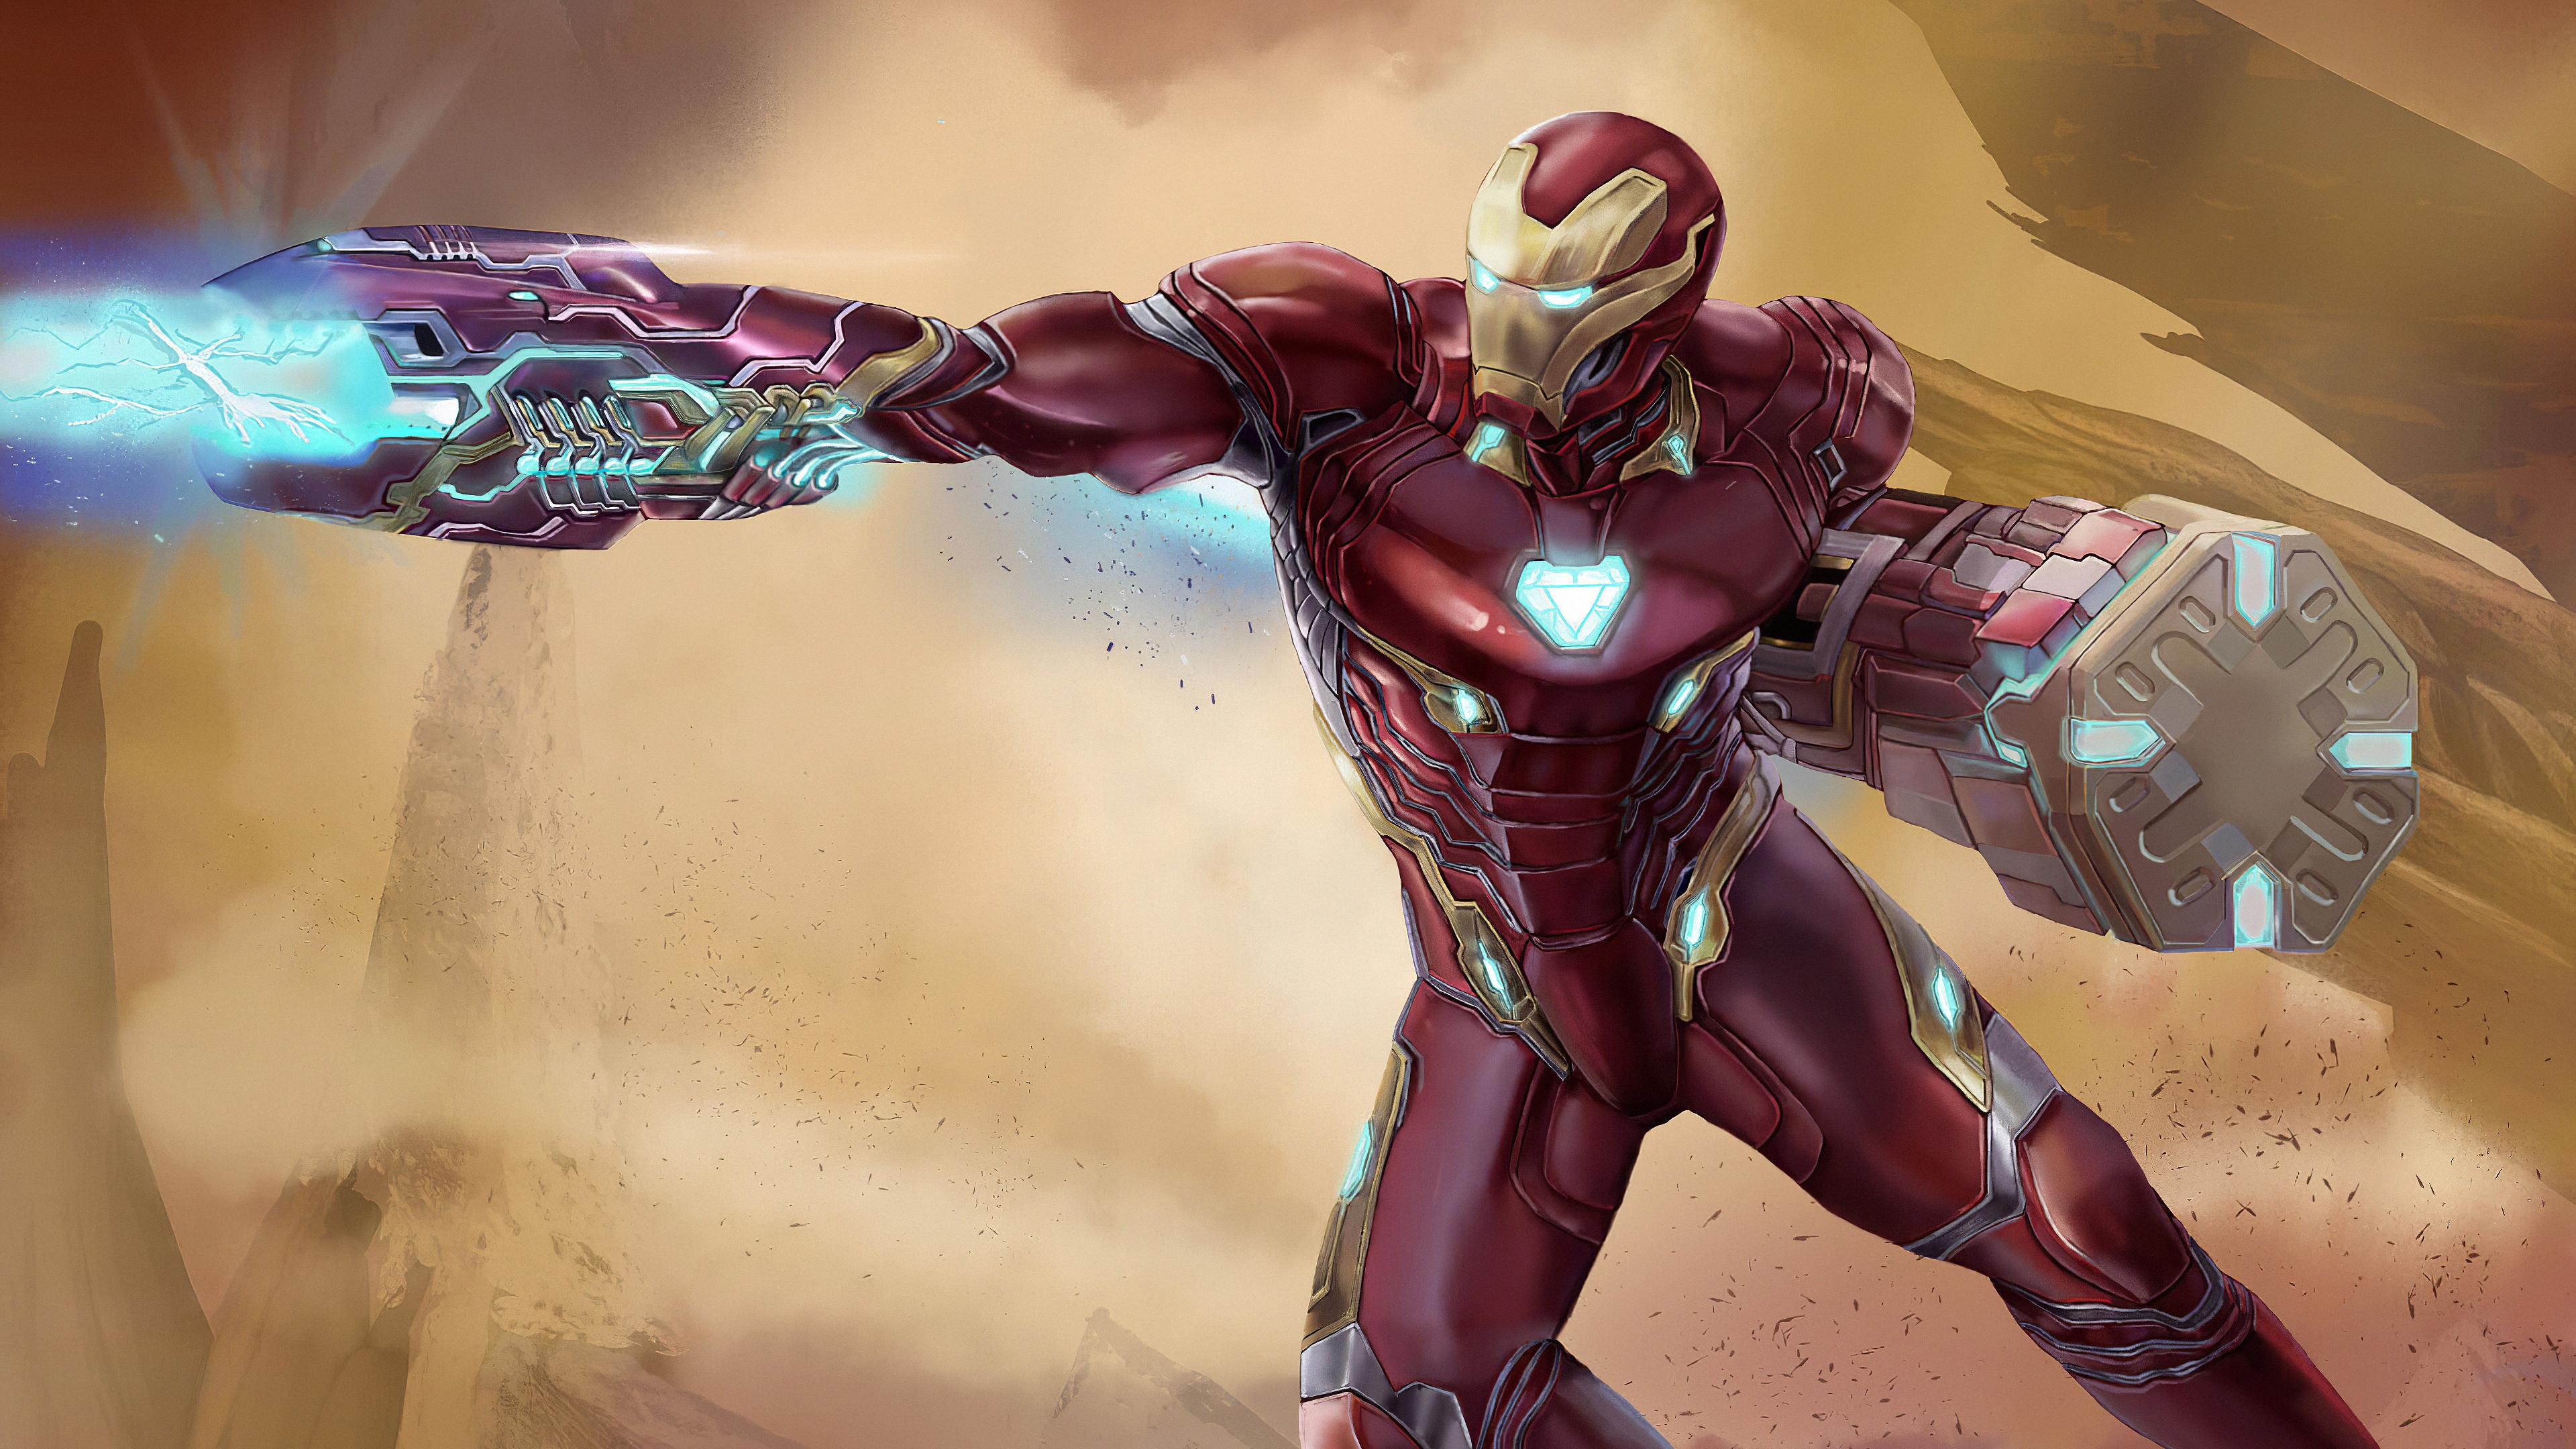 Wallpaper 4k Blaster Iron Man Art Iron Man 4k Hd Wallpaper